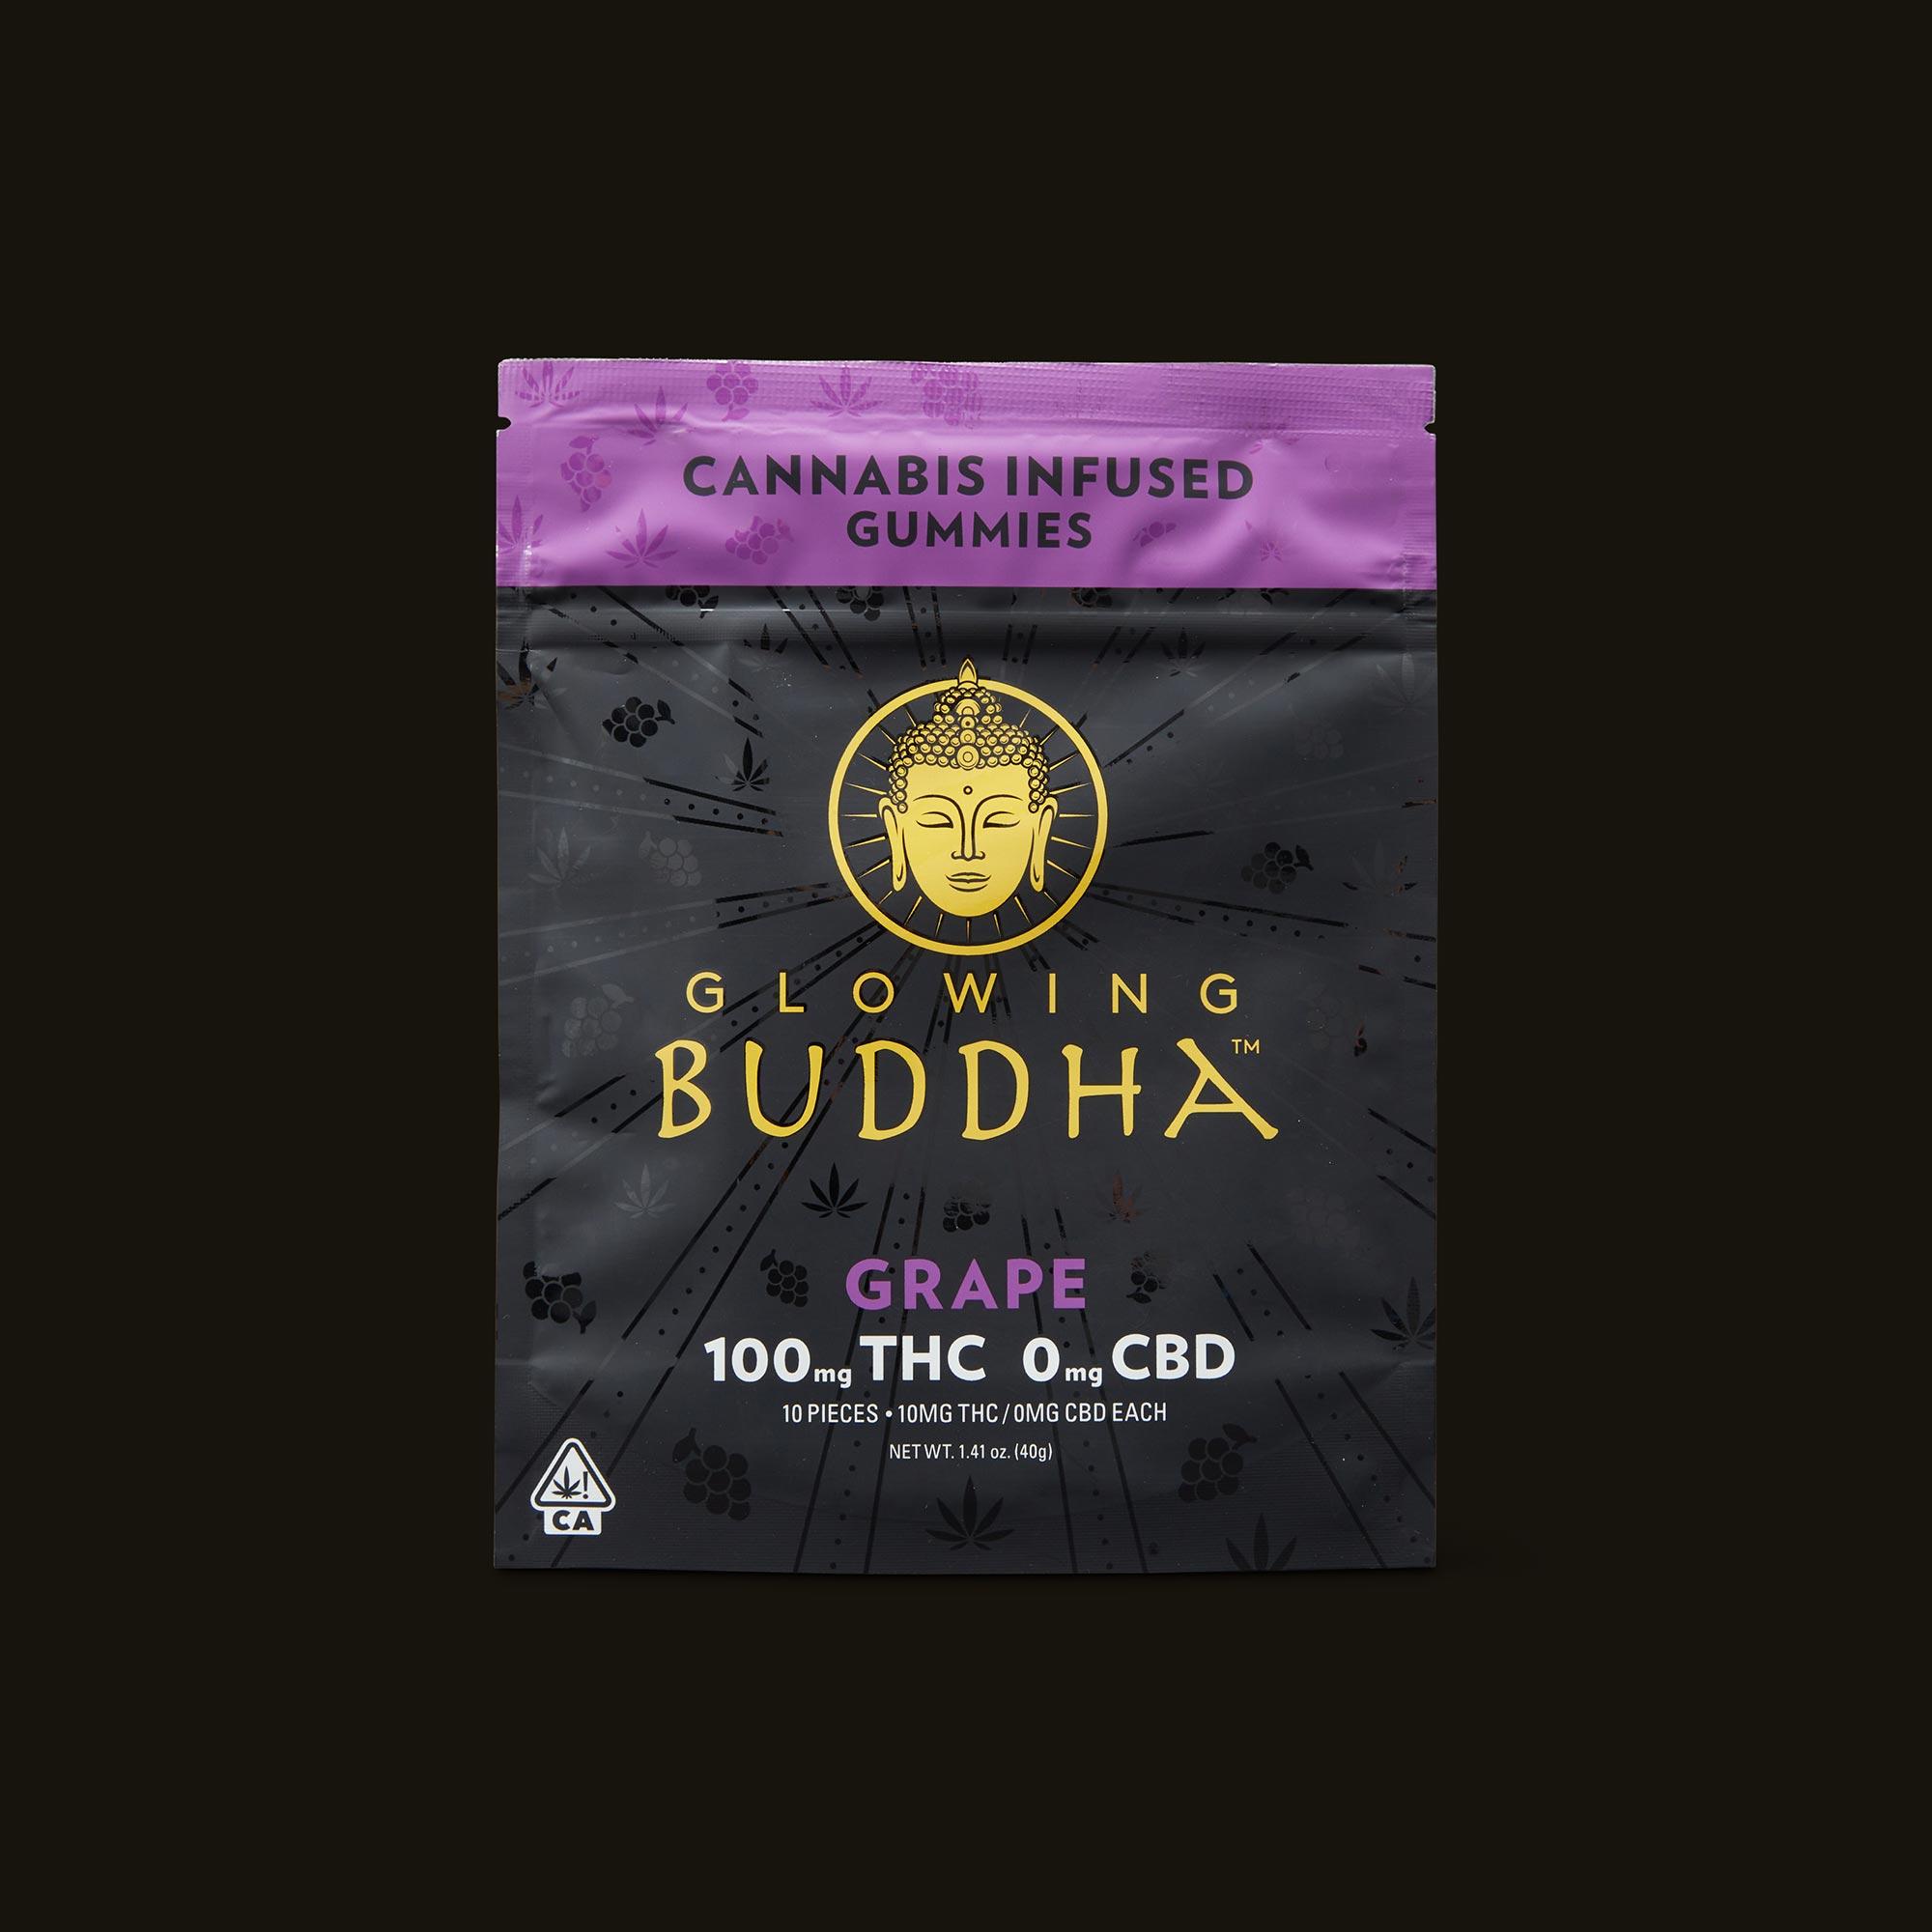 Glowing Buddha Grape Gummies Front Packaging